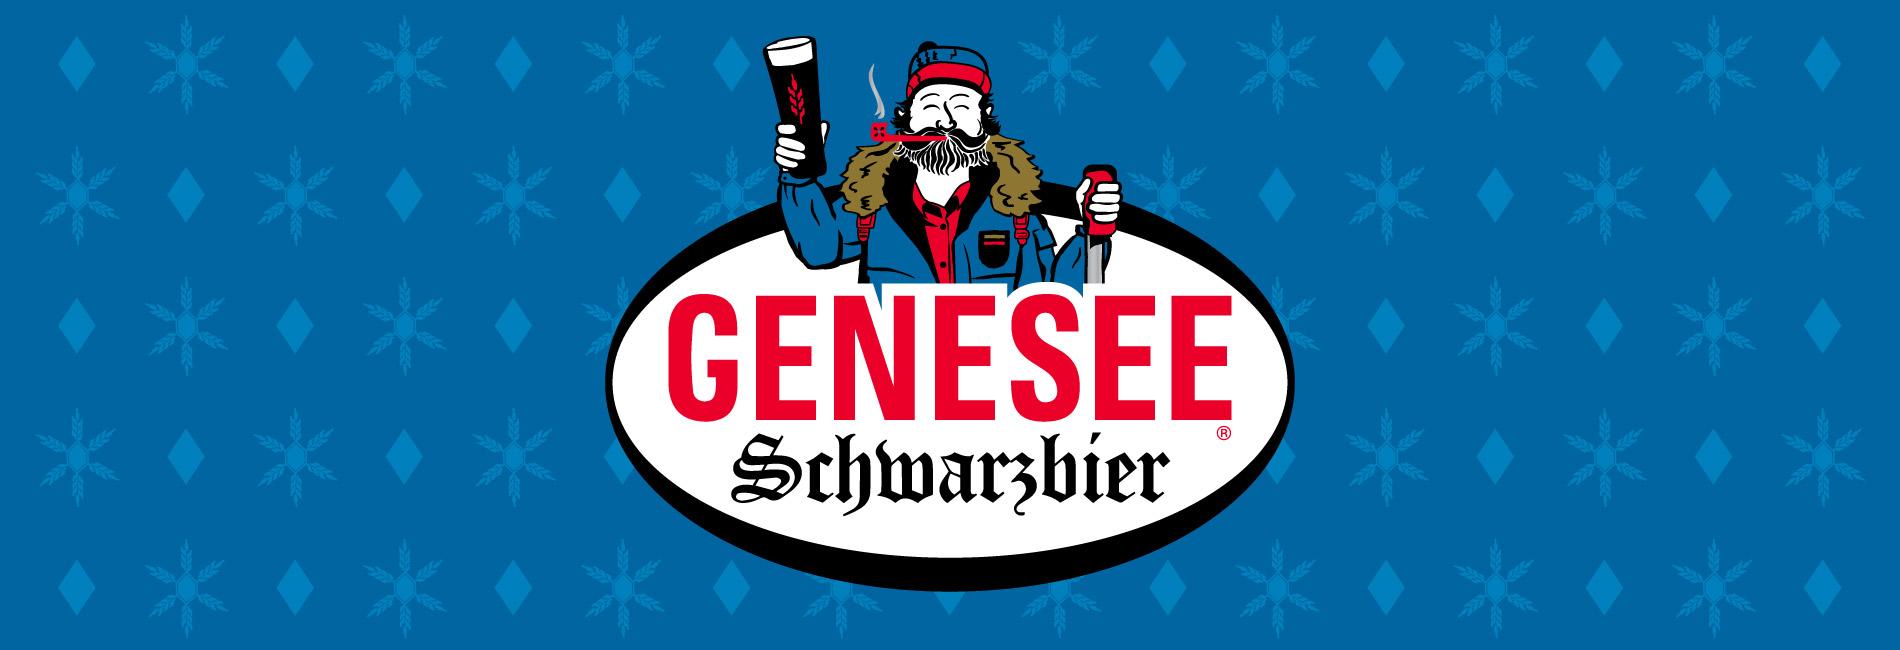 Genesee Schwarzbier